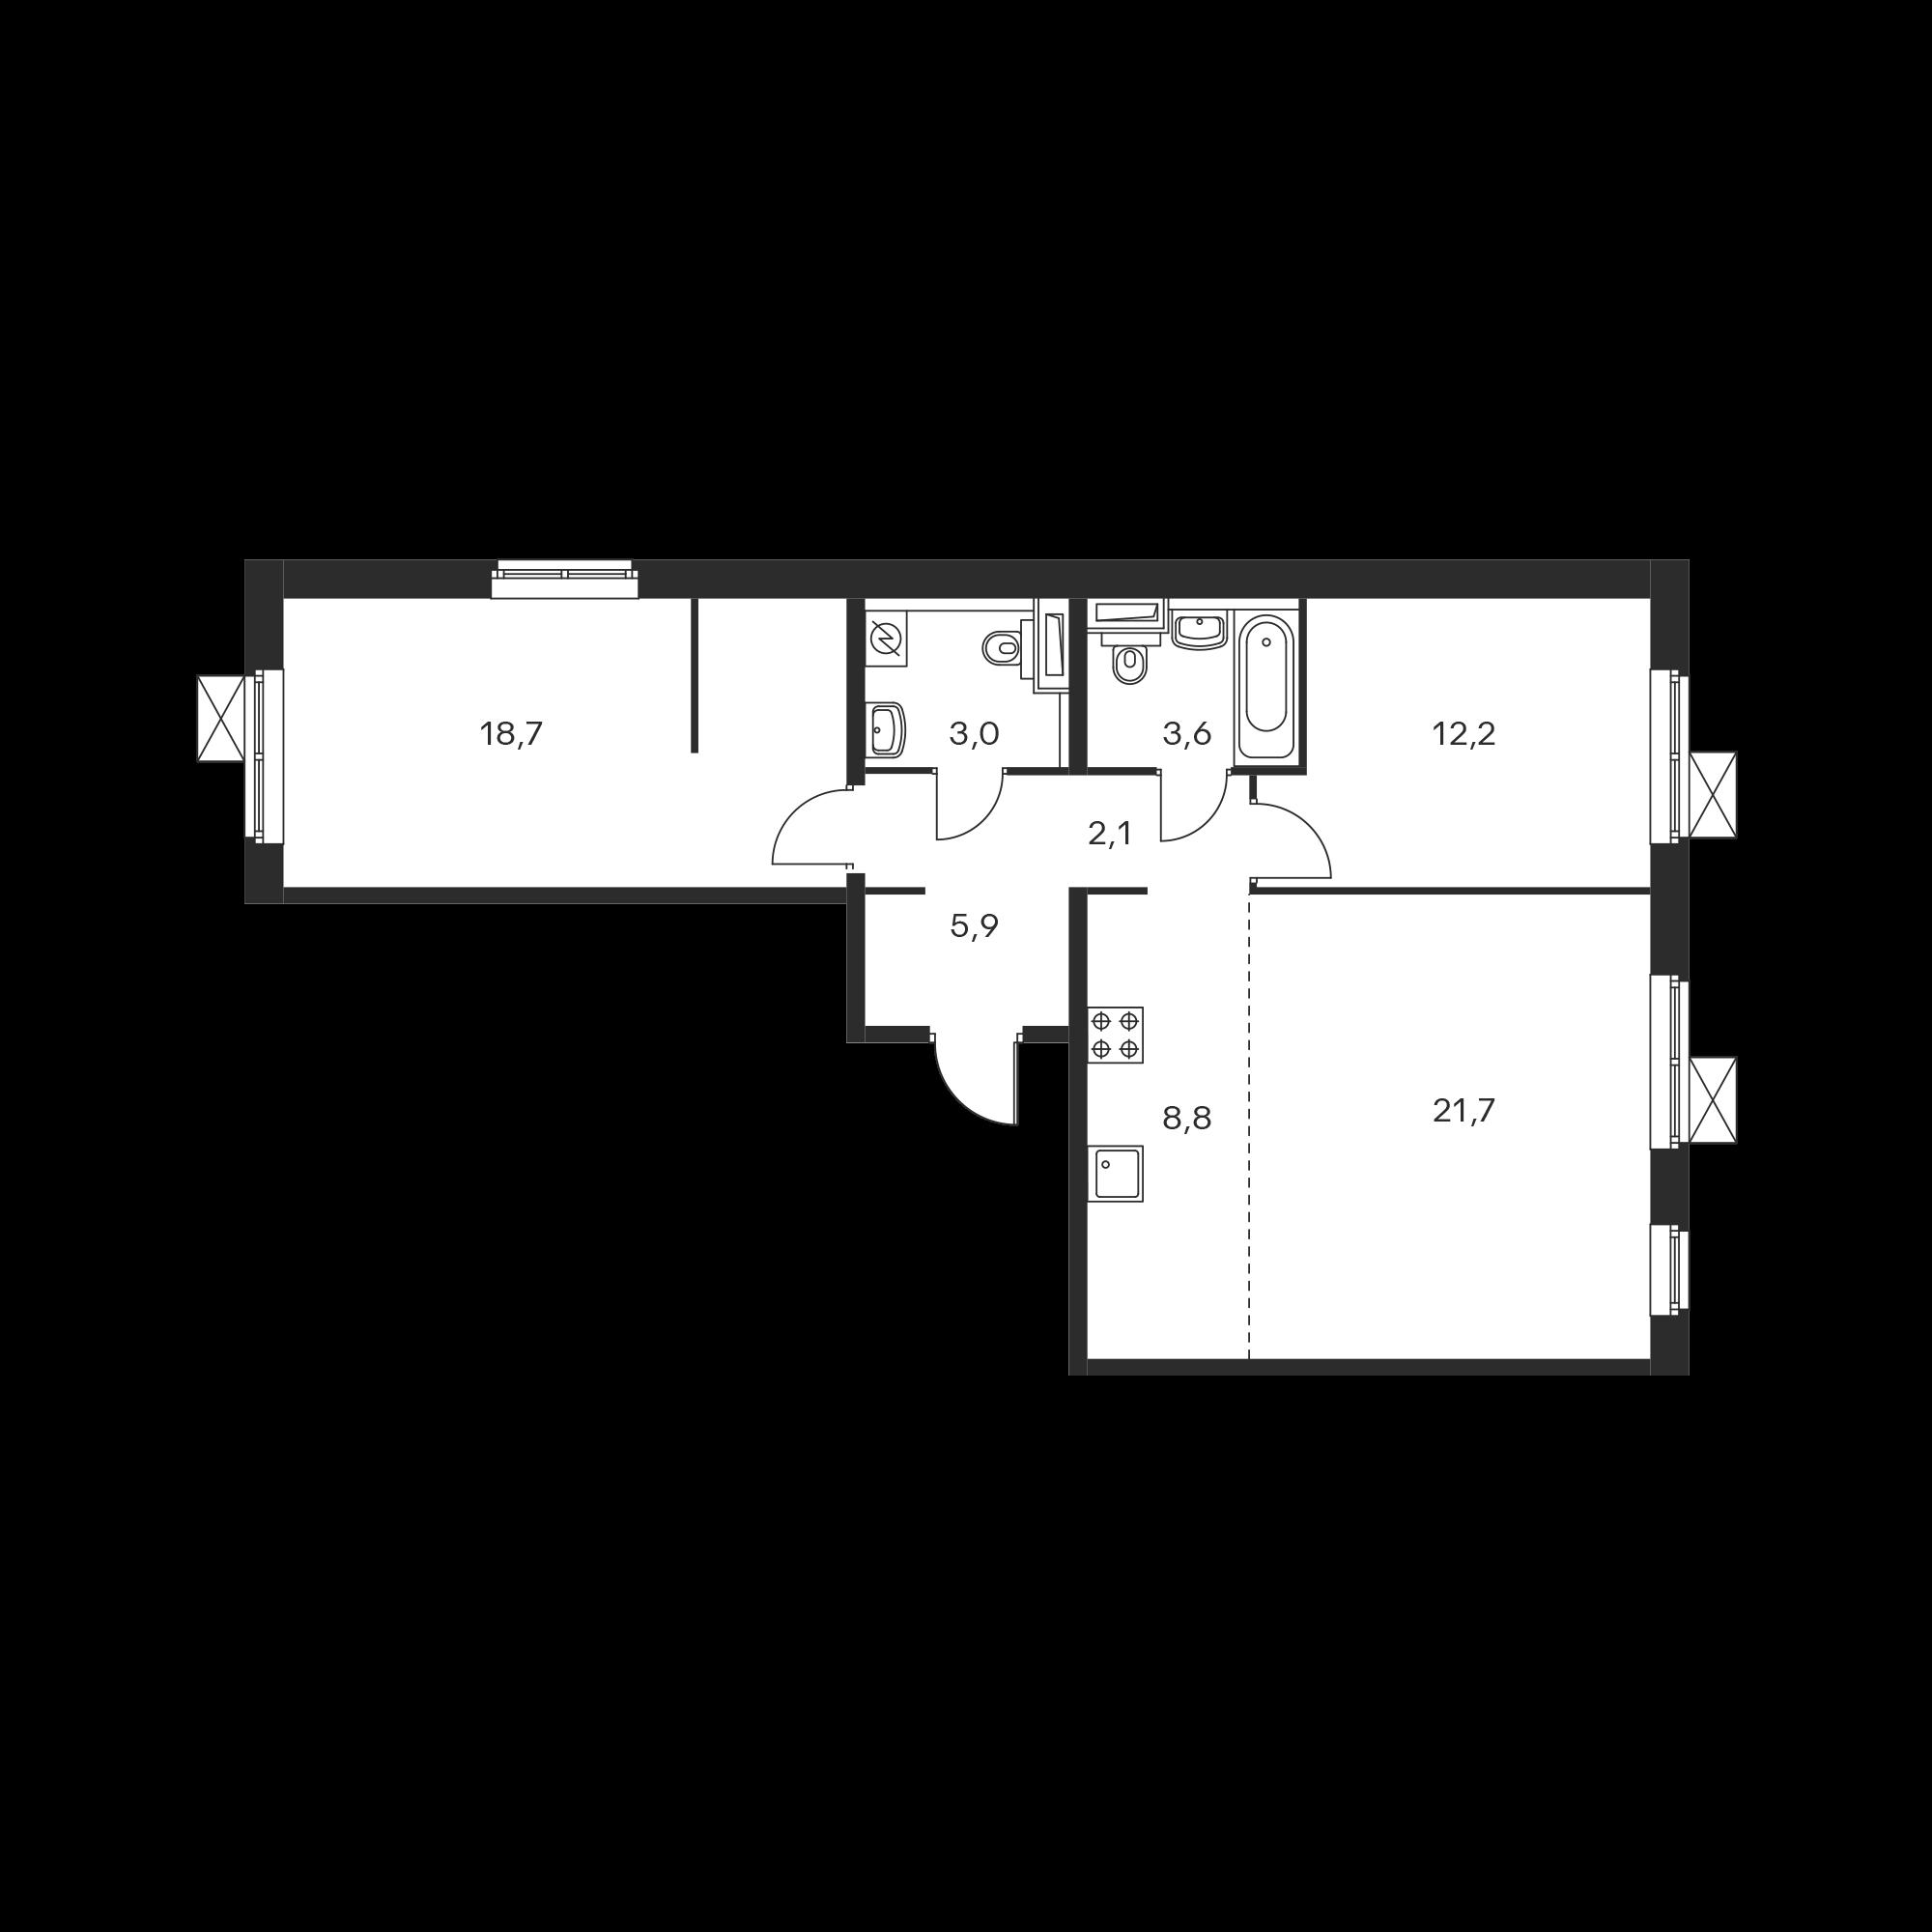 3NM12_8.4-2